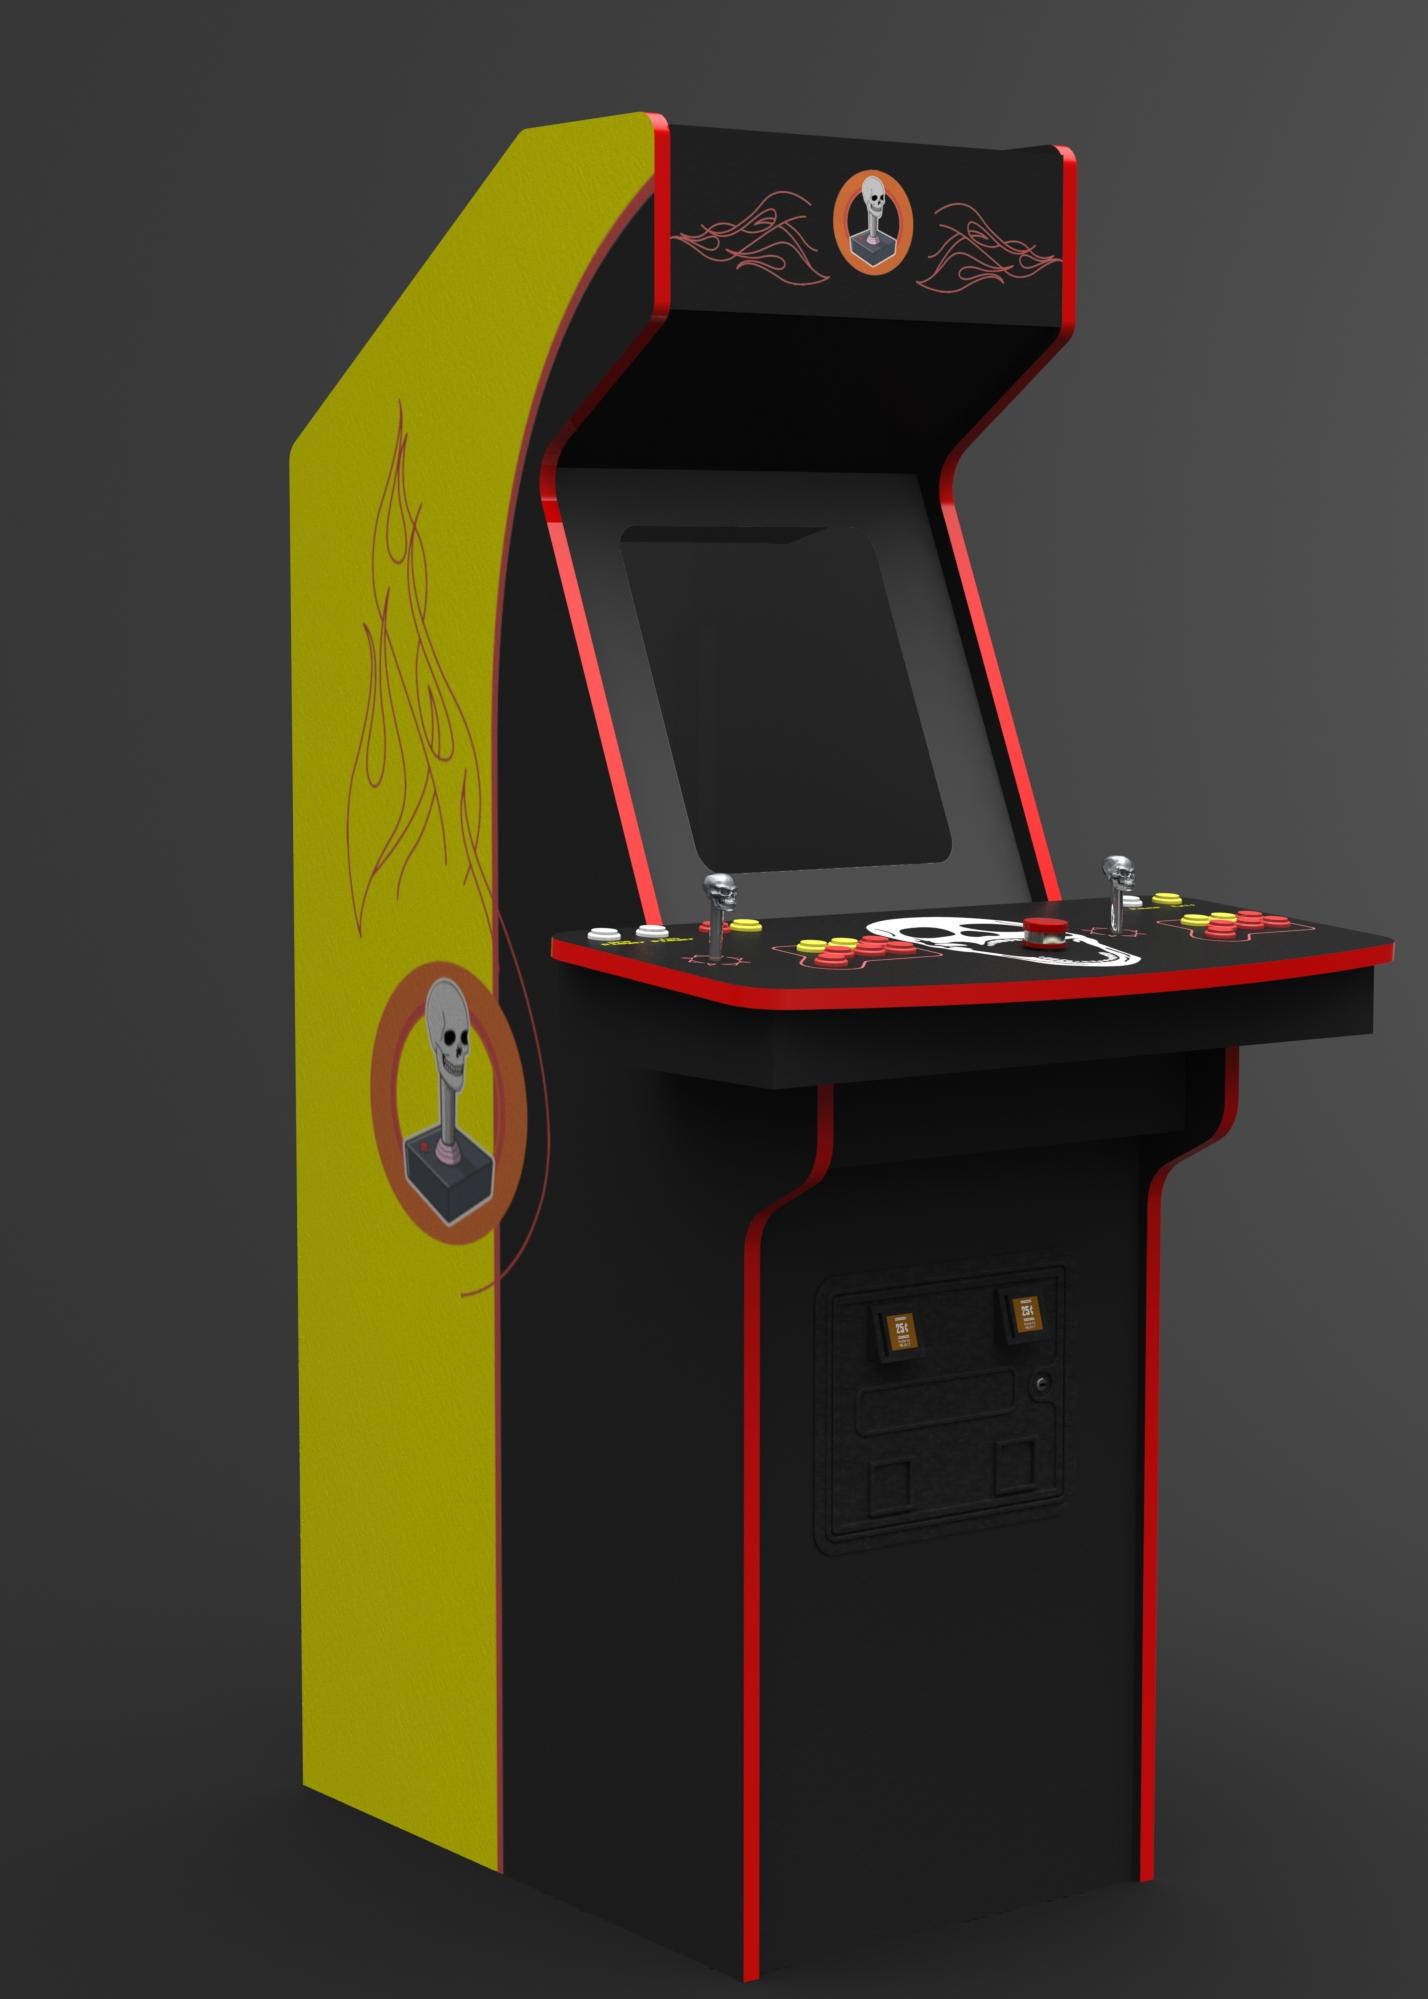 Raspberry PI Arcade Cabinet Part I - News - SparkFun Electronics